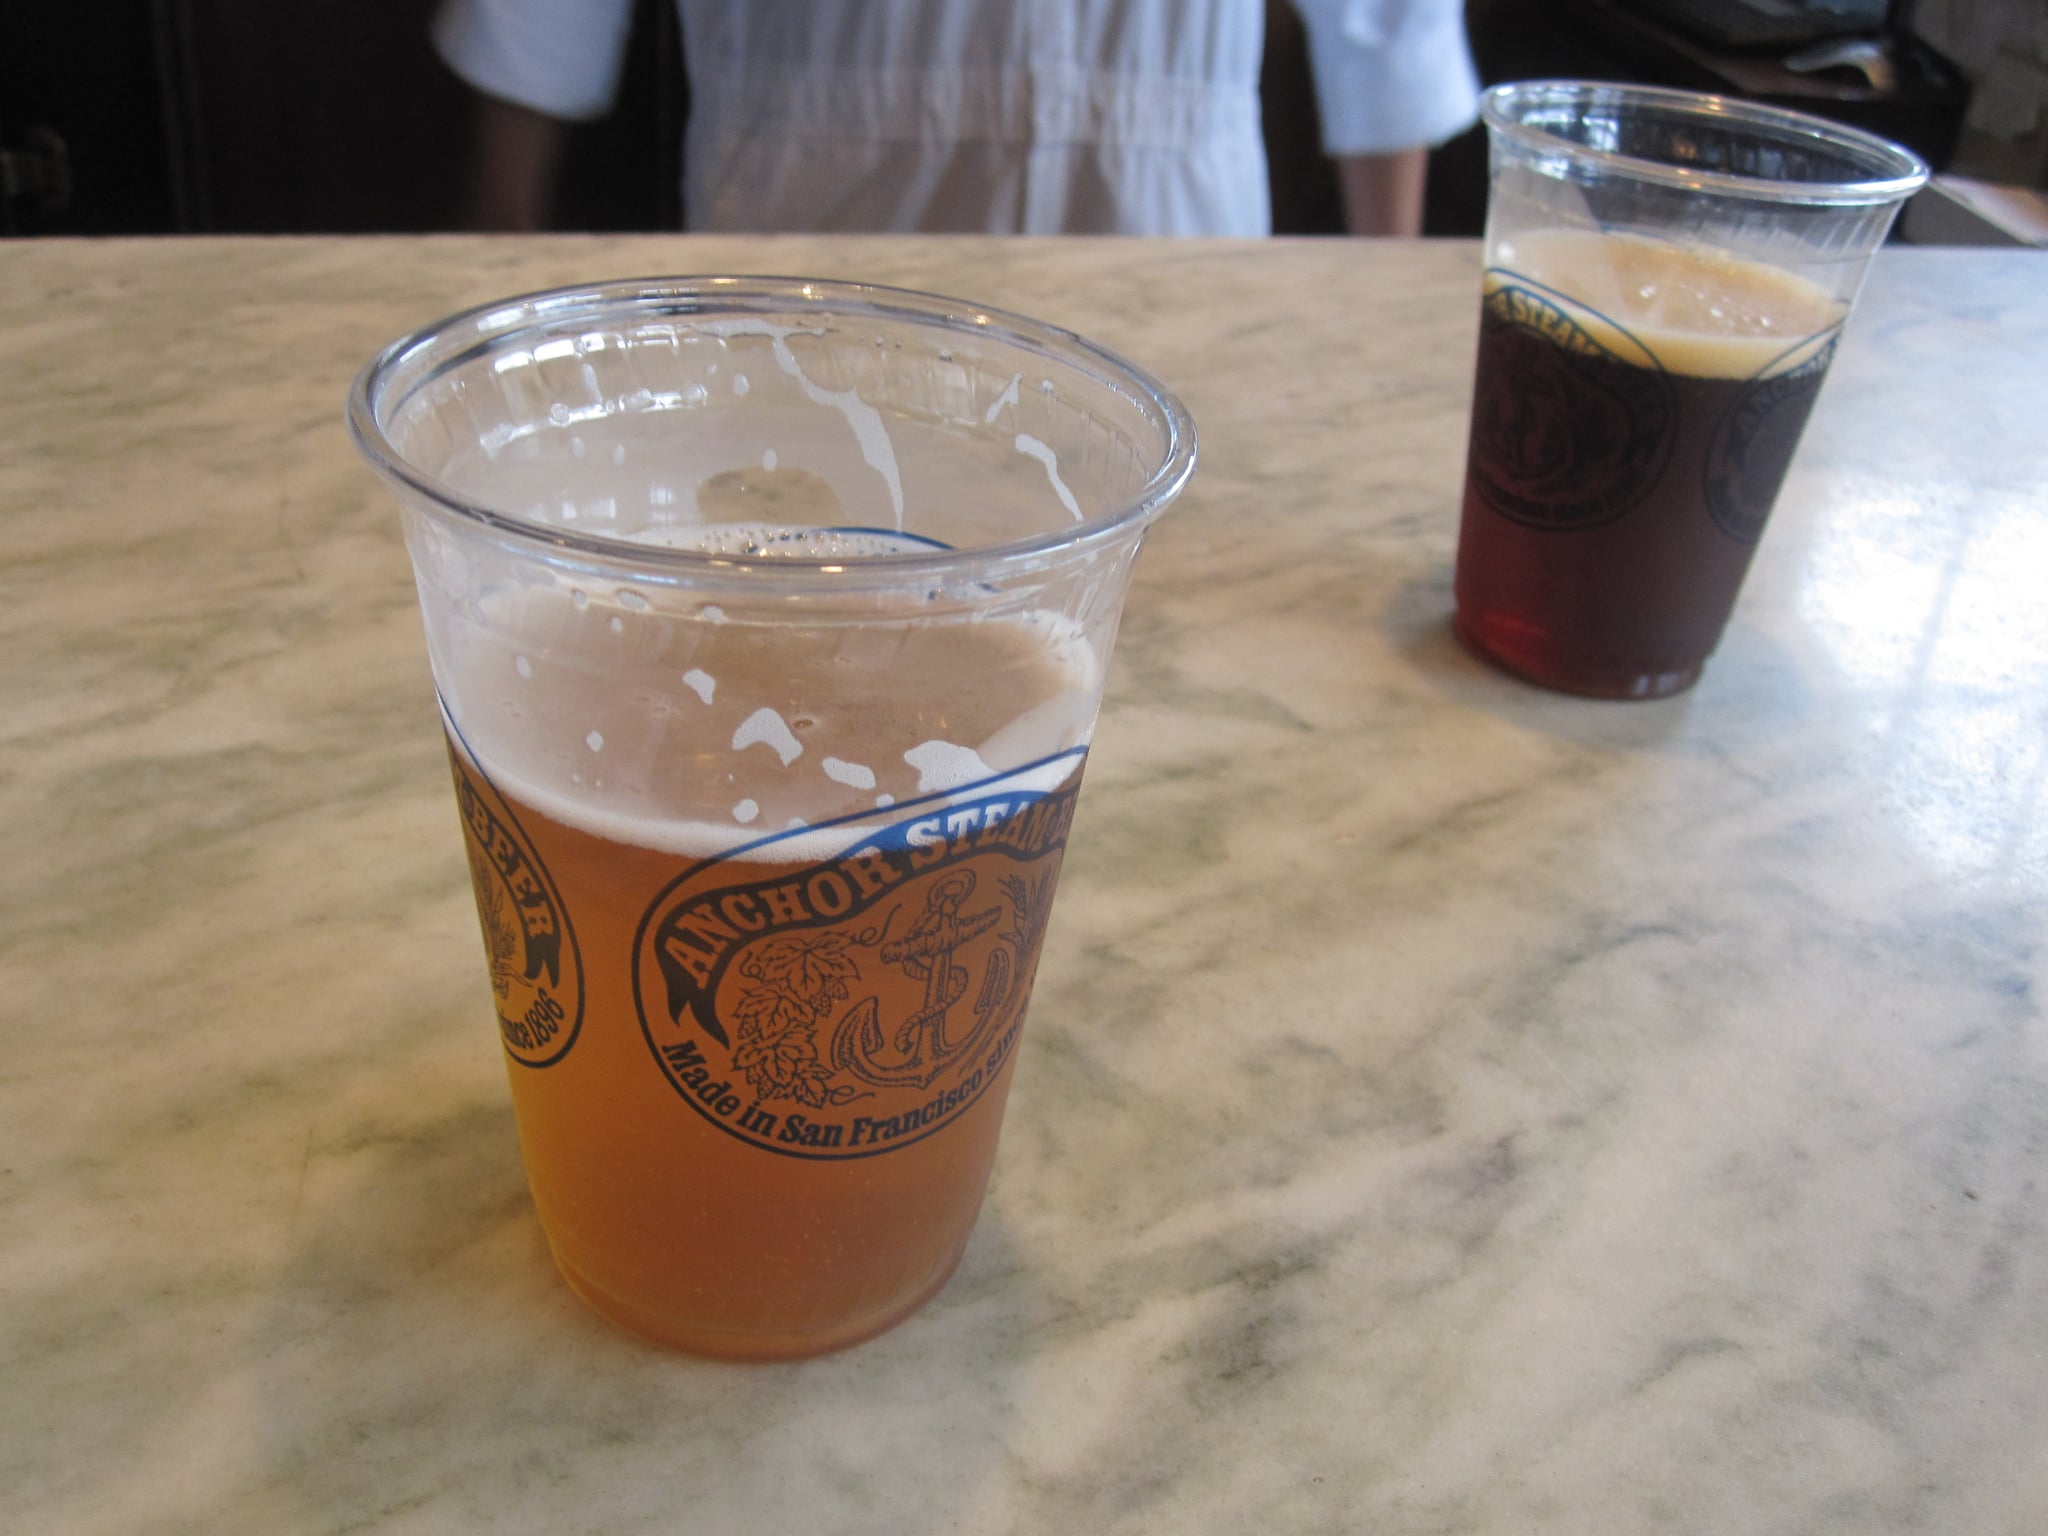 I sampled their Summer beer!